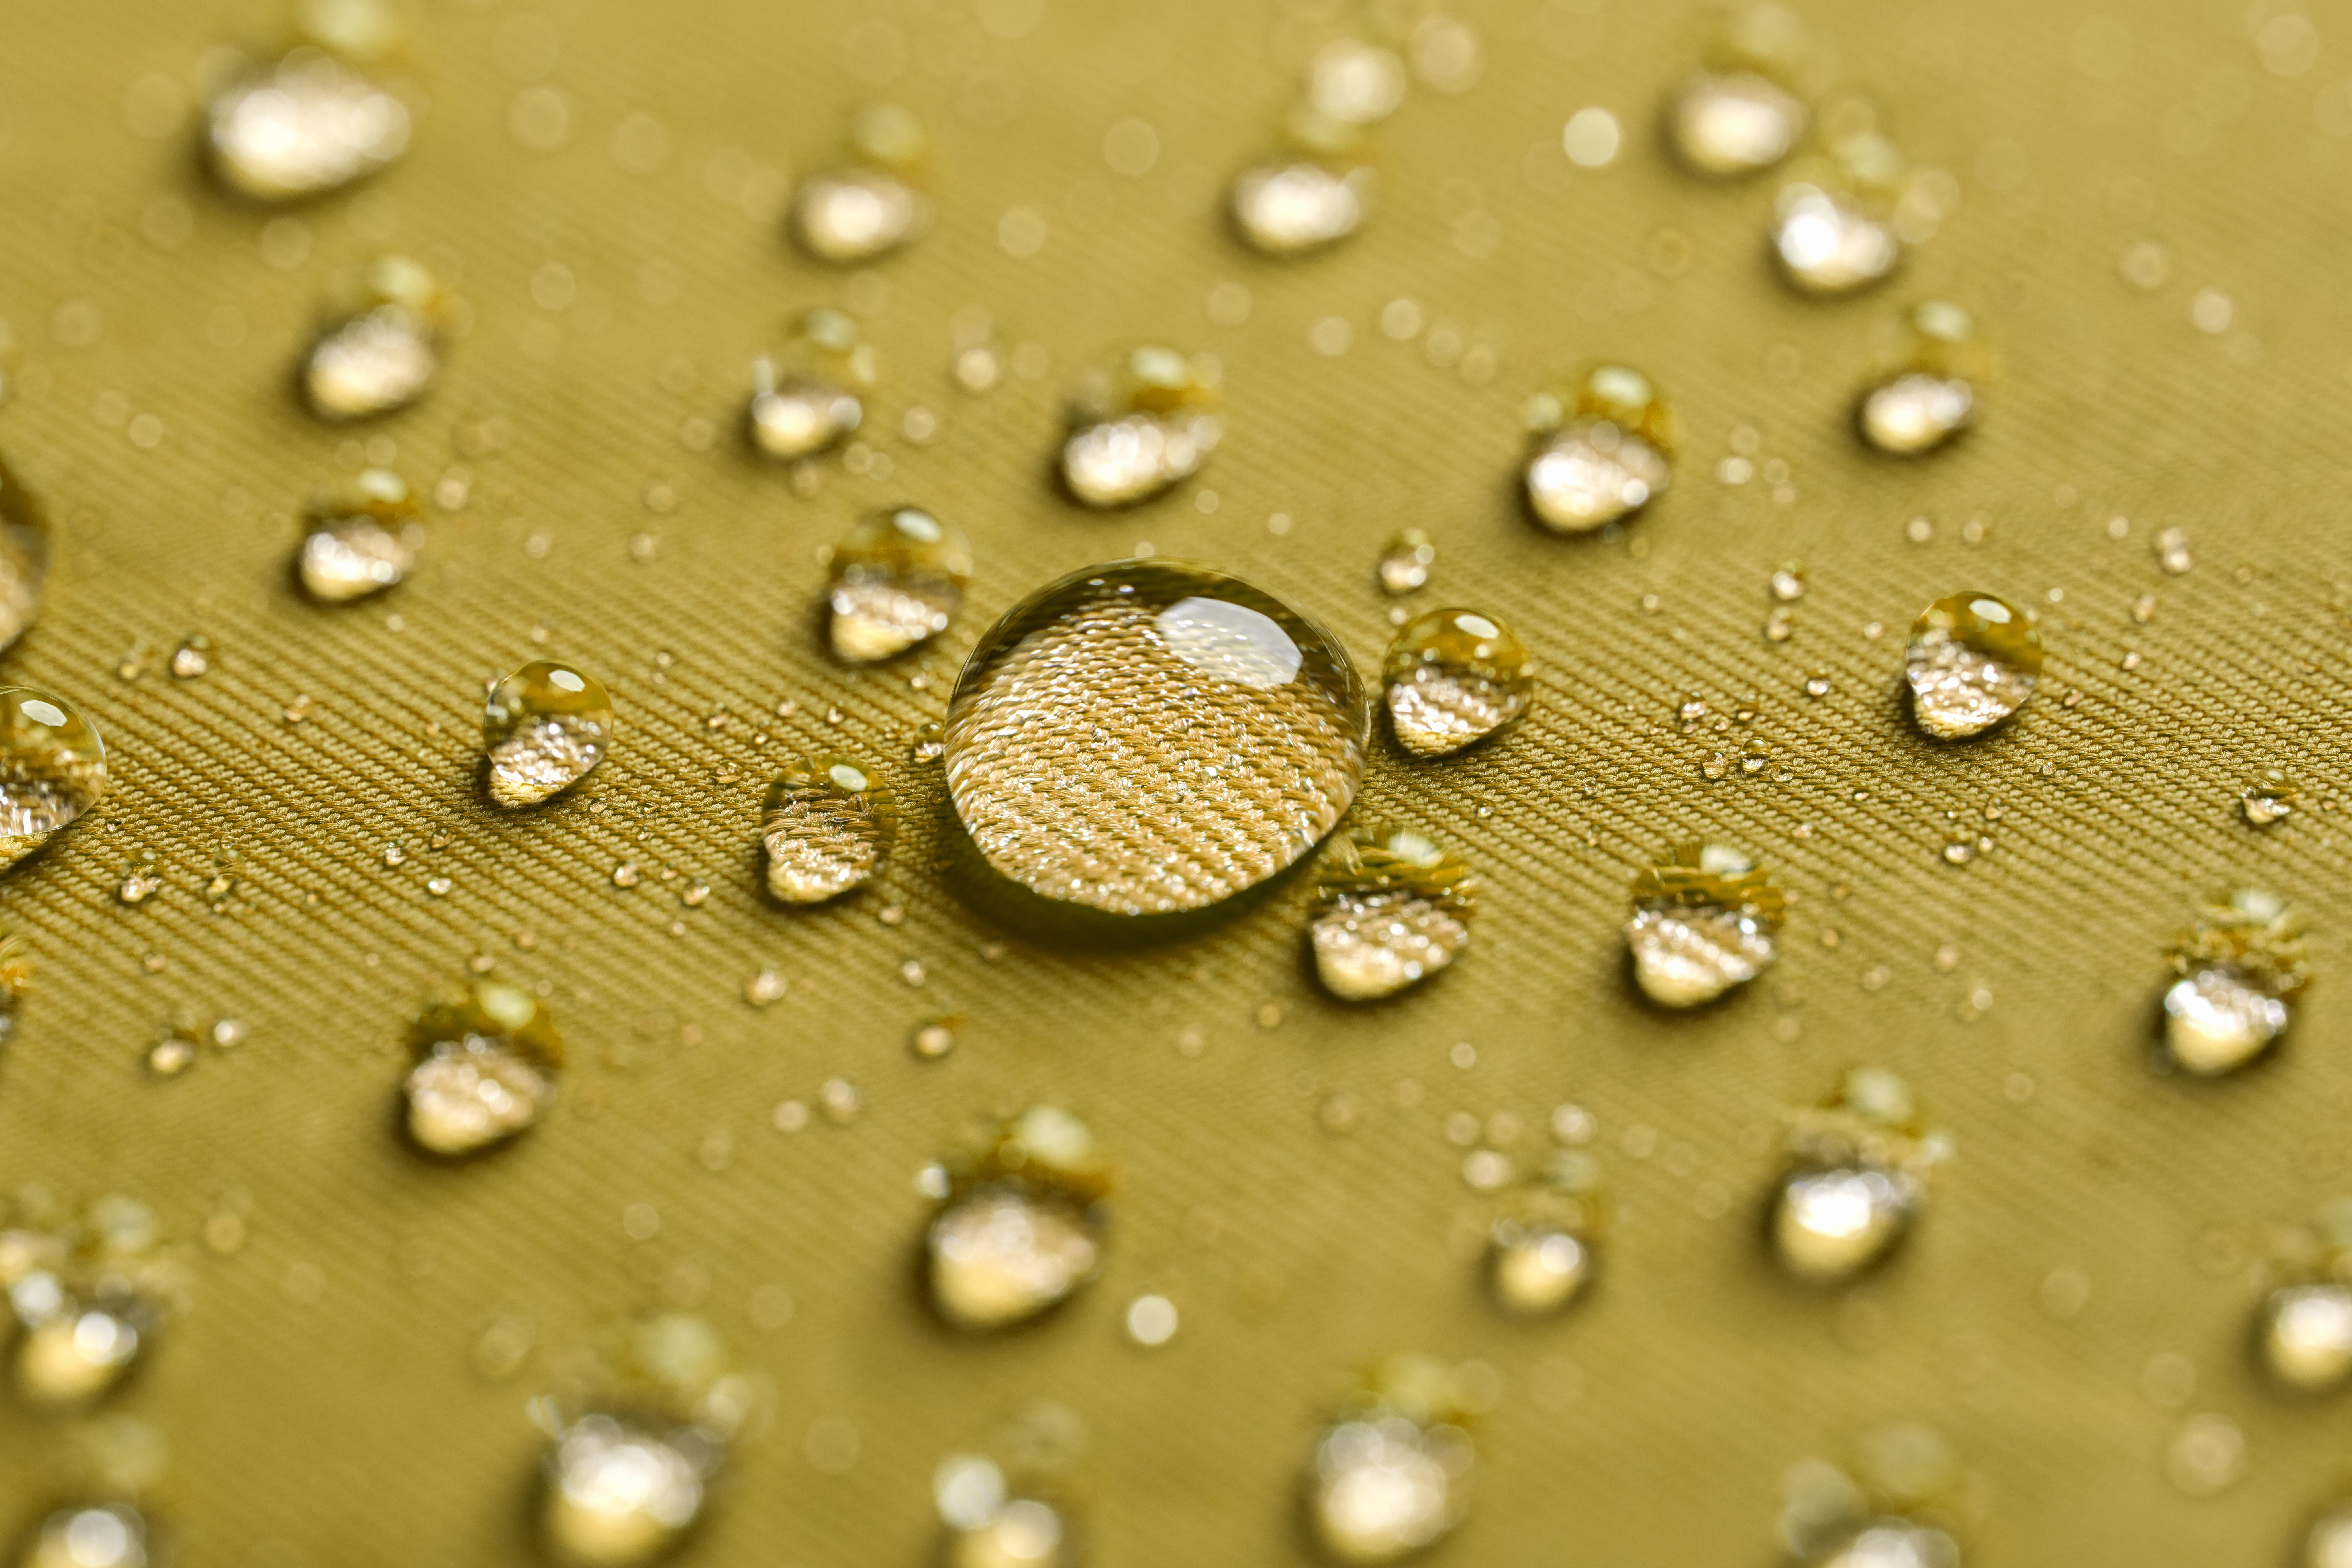 Water drops on a waterproof fabric